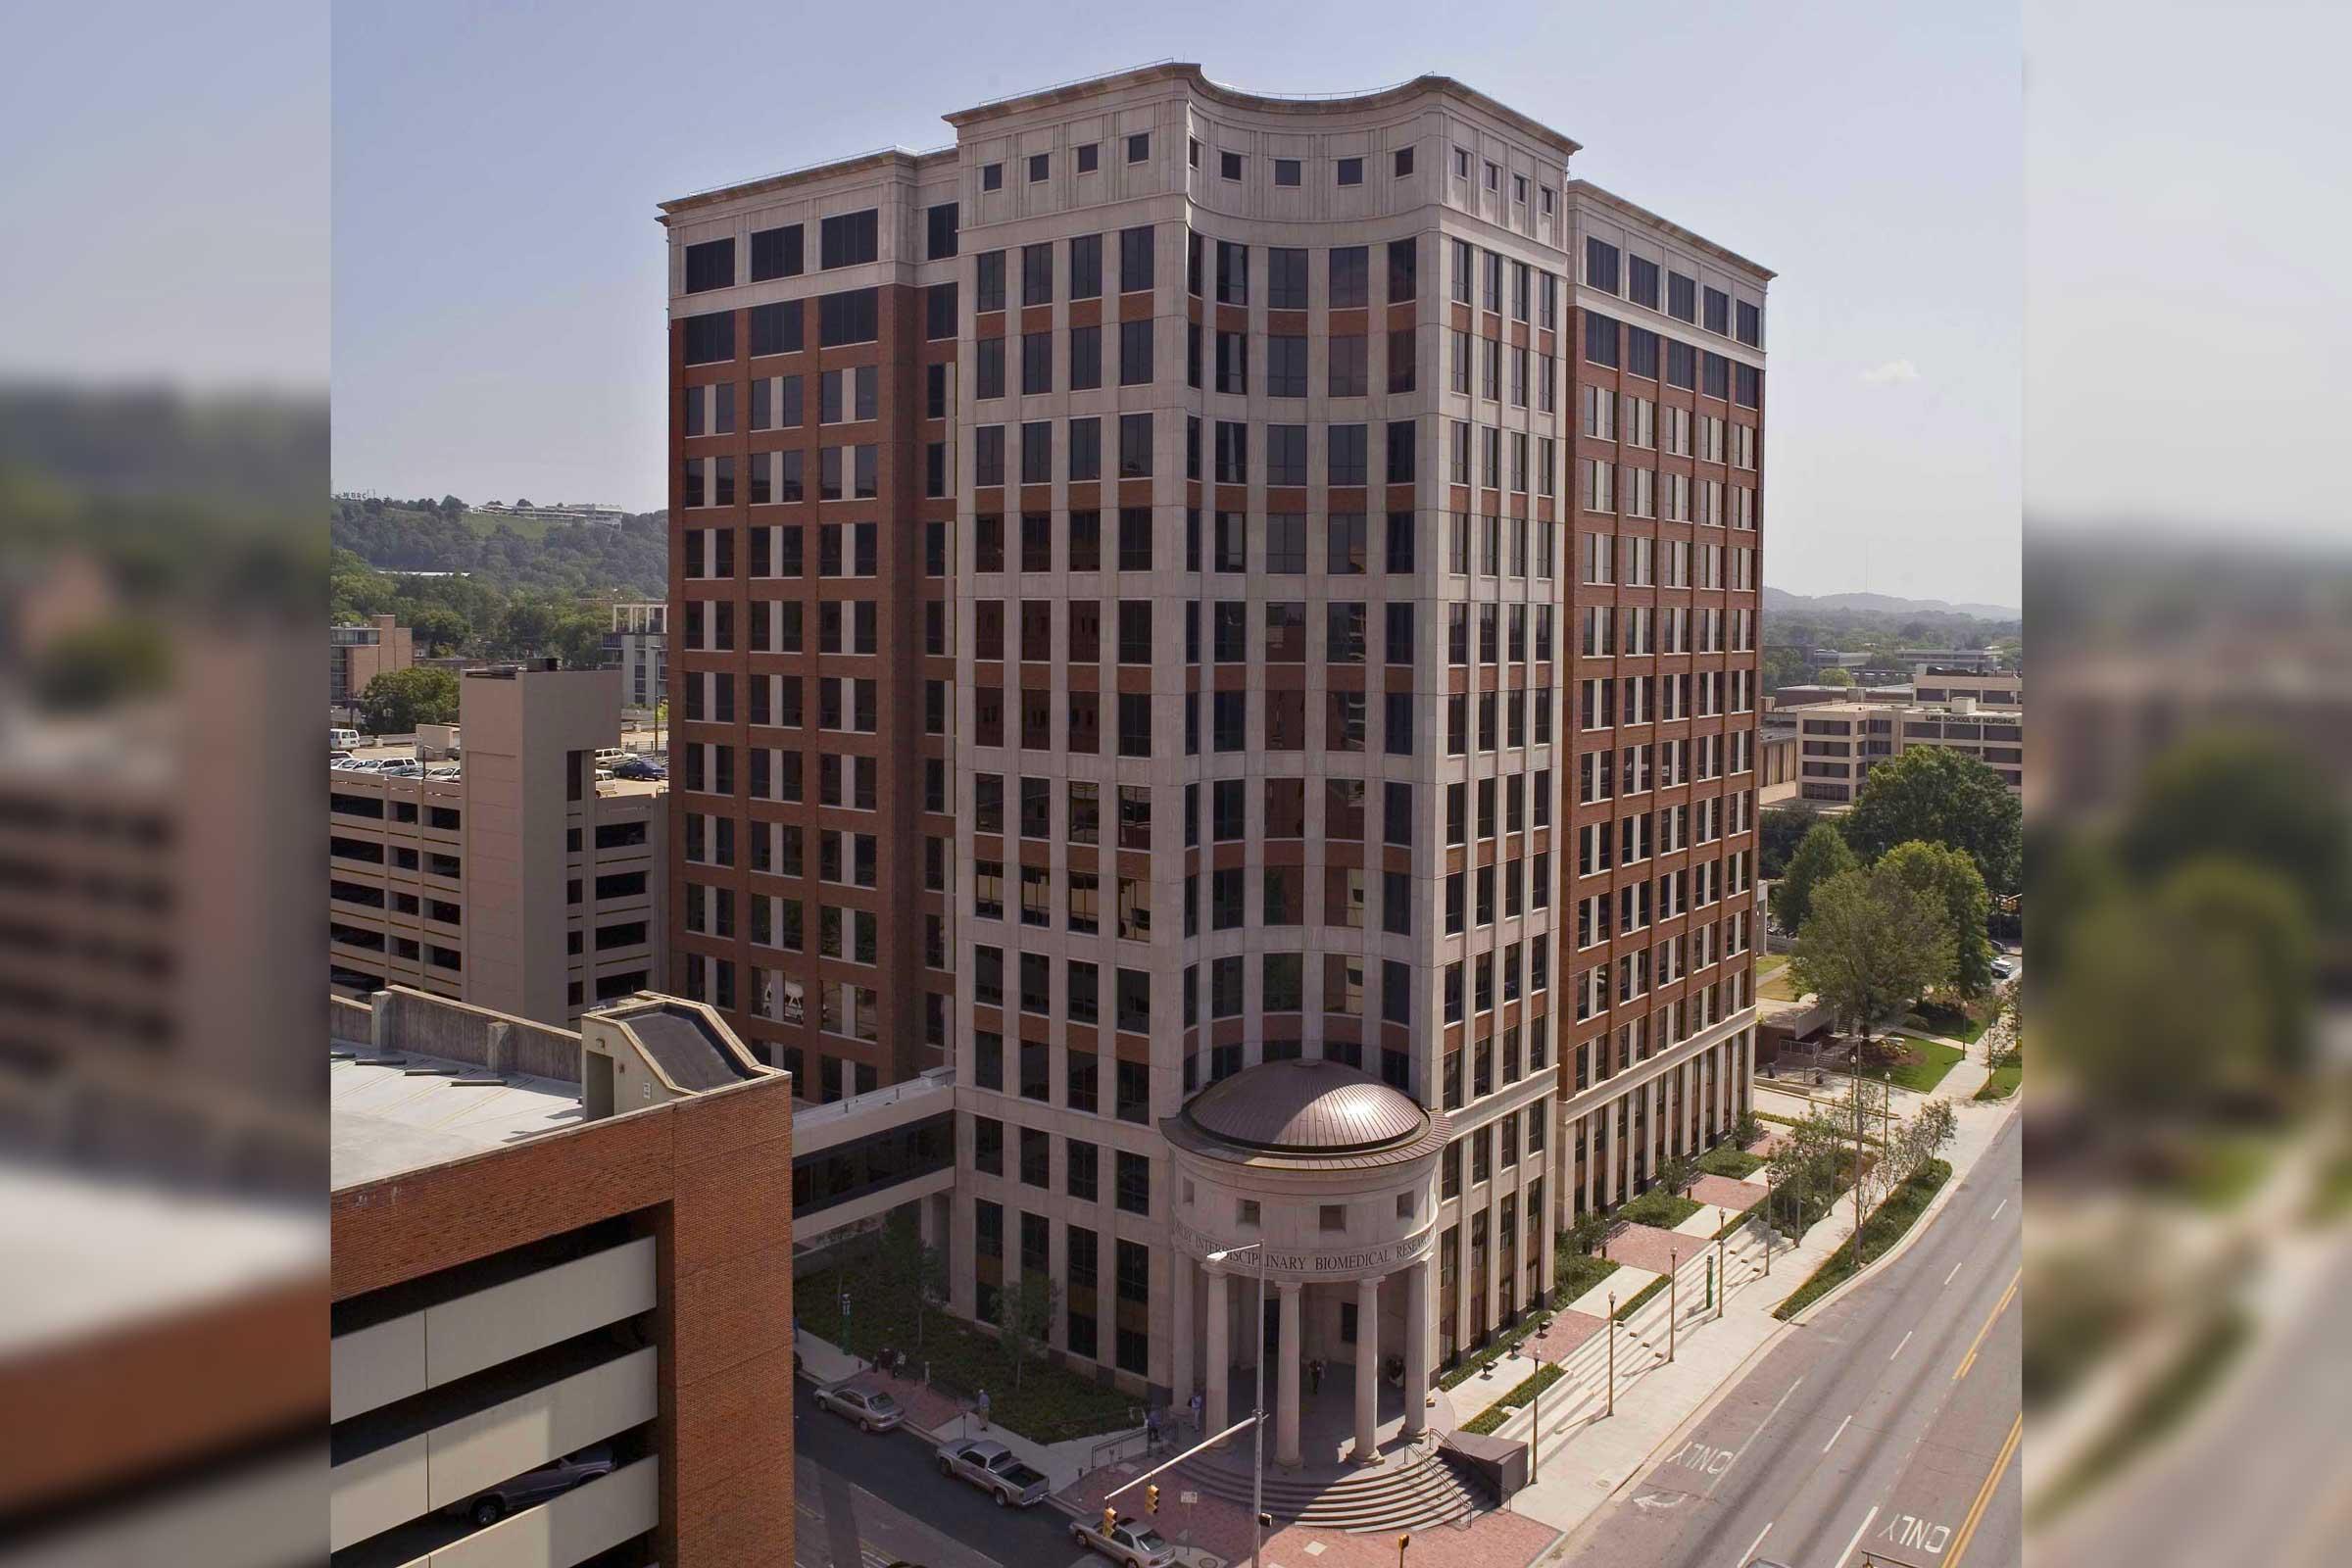 UAB Biomedical Research Building